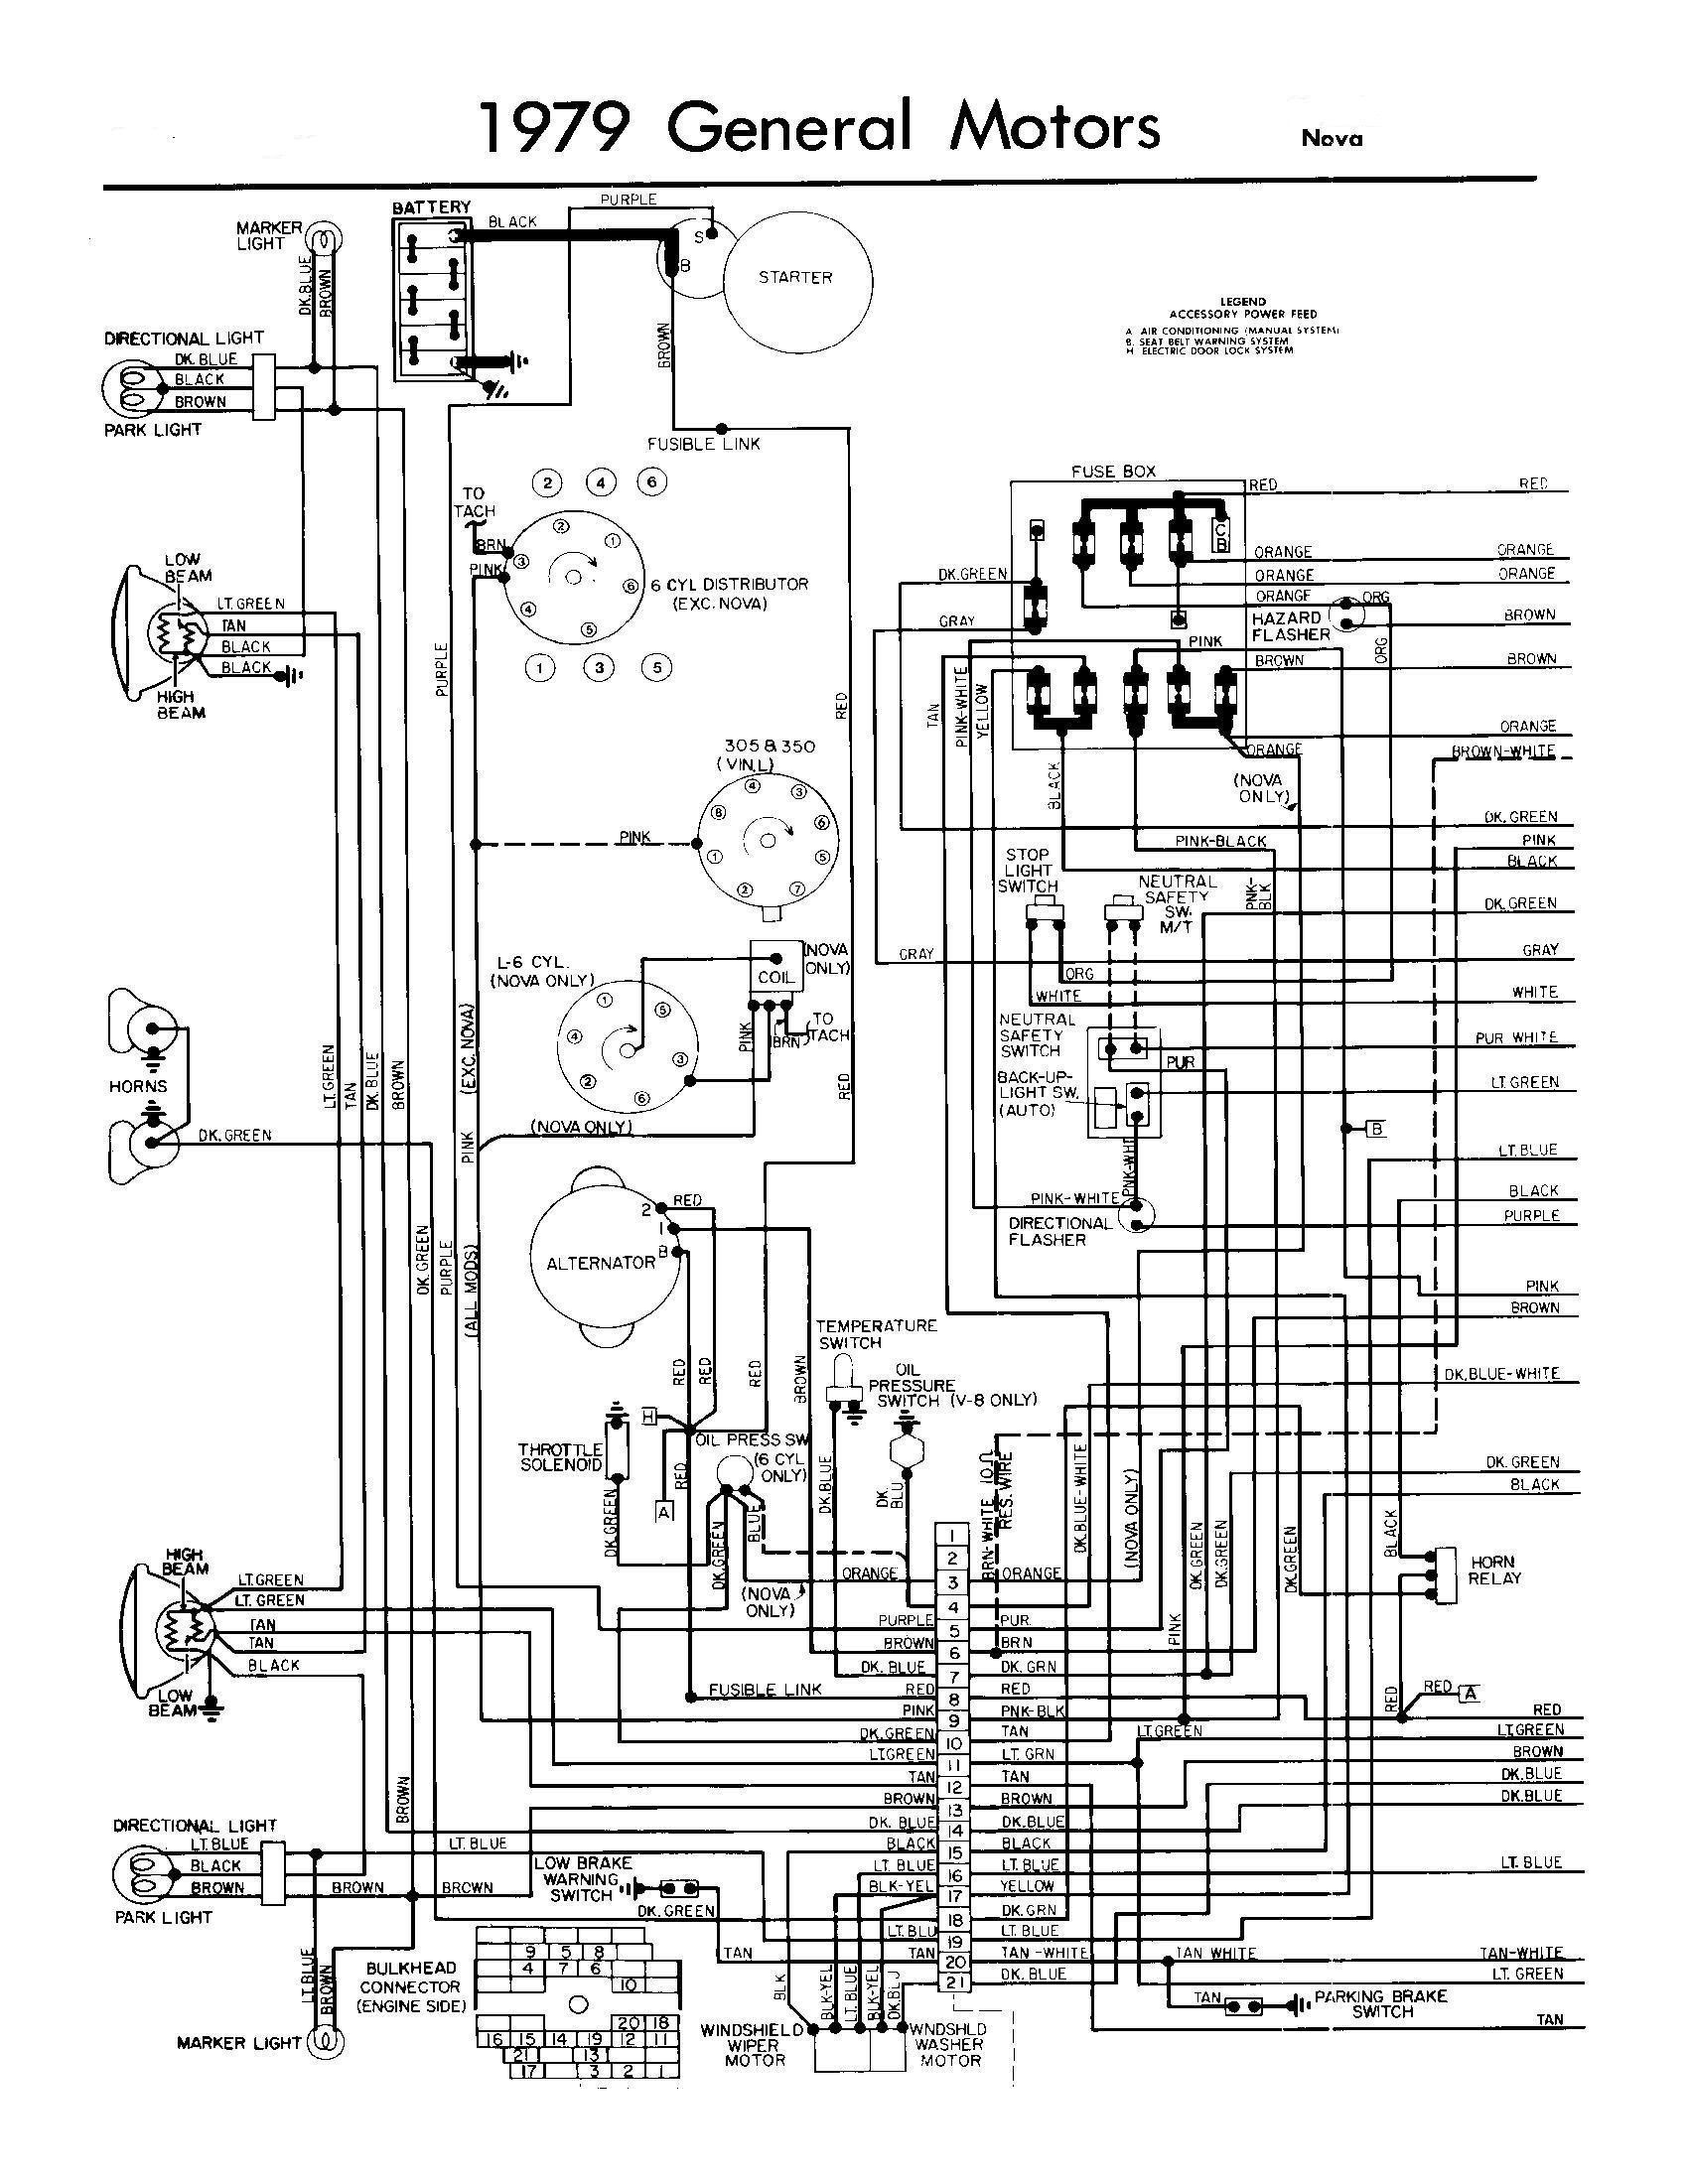 Inspirational tarp switch wiring diagram wiring diagram image hes 9600 12 24d 630 wiring diagram download 4900 wiring diagram additionally on electric tarp download ccuart Choice Image